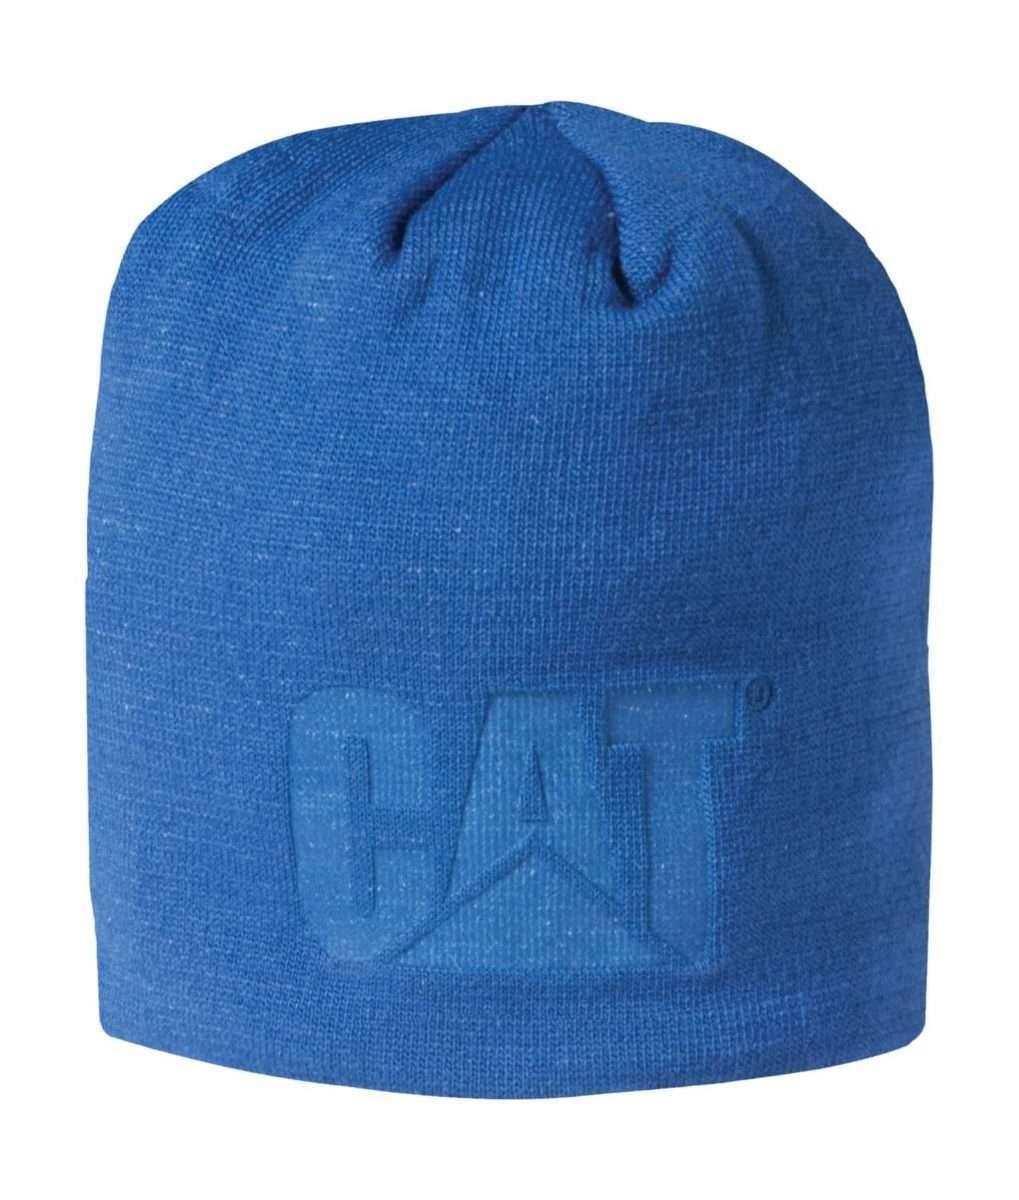 CAT Trademark Knit Beanie